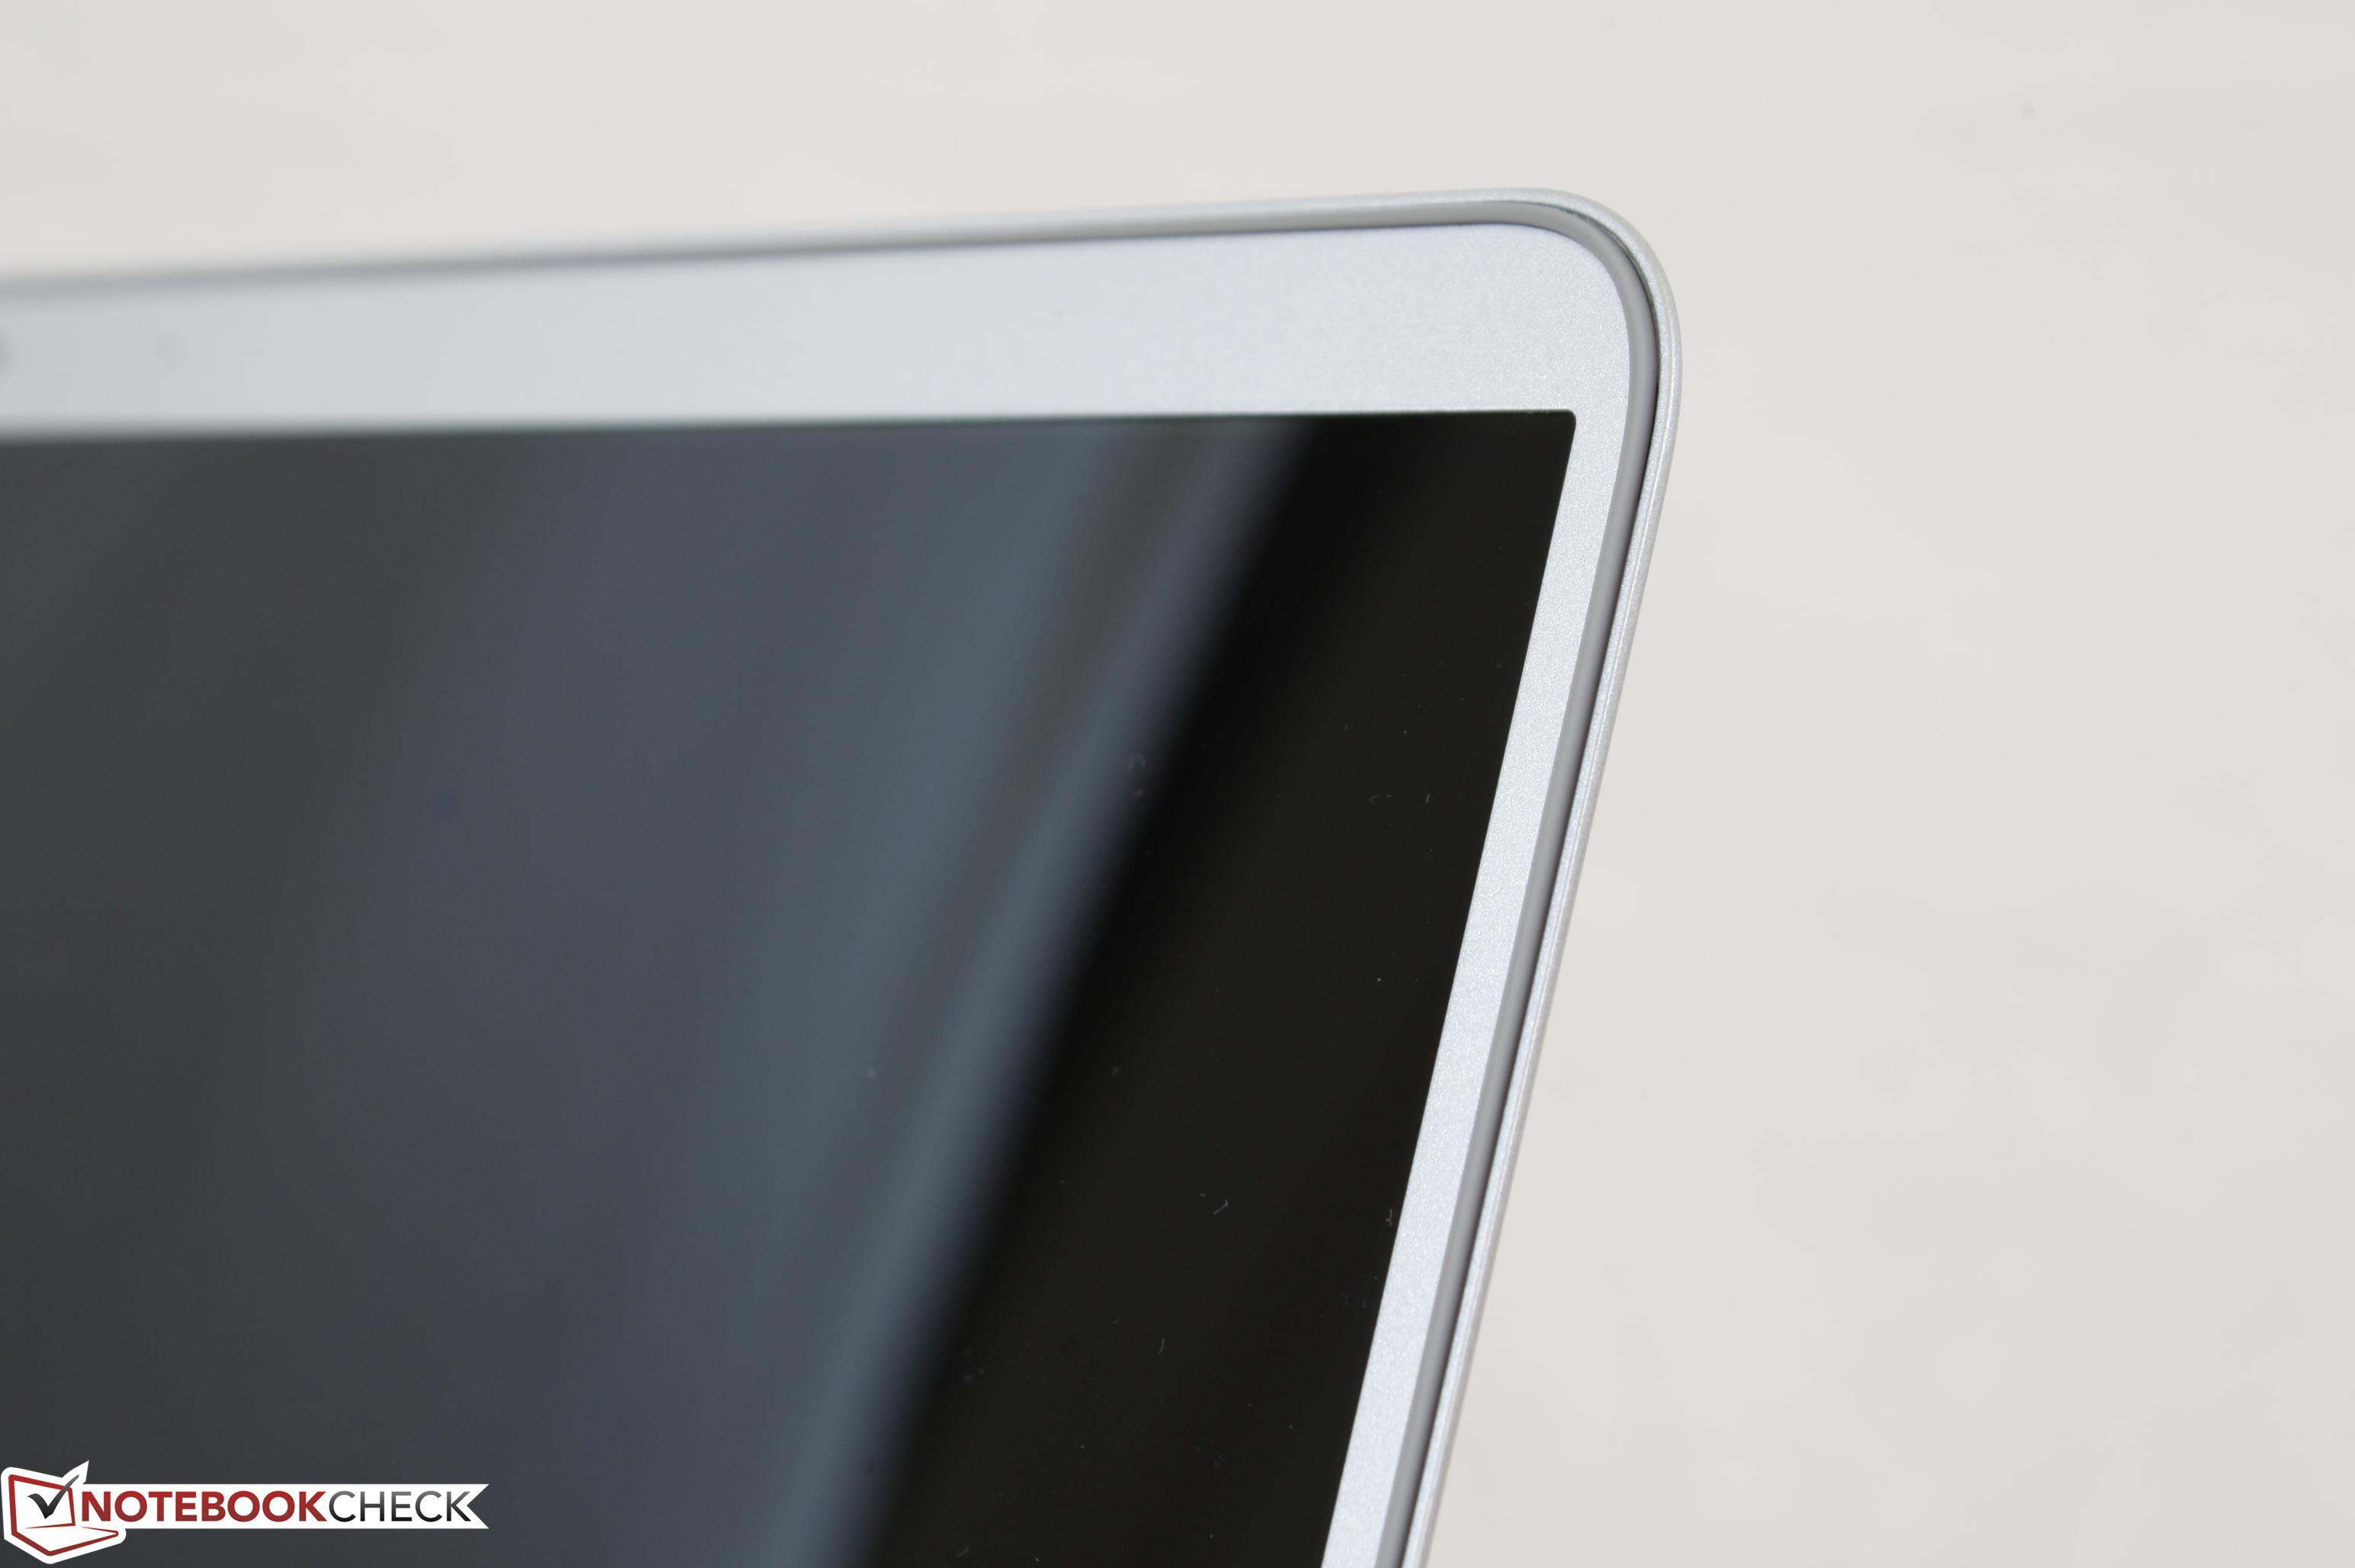 Samsung Notebook 9 NP900X5N (7500U 380a7c7e3b